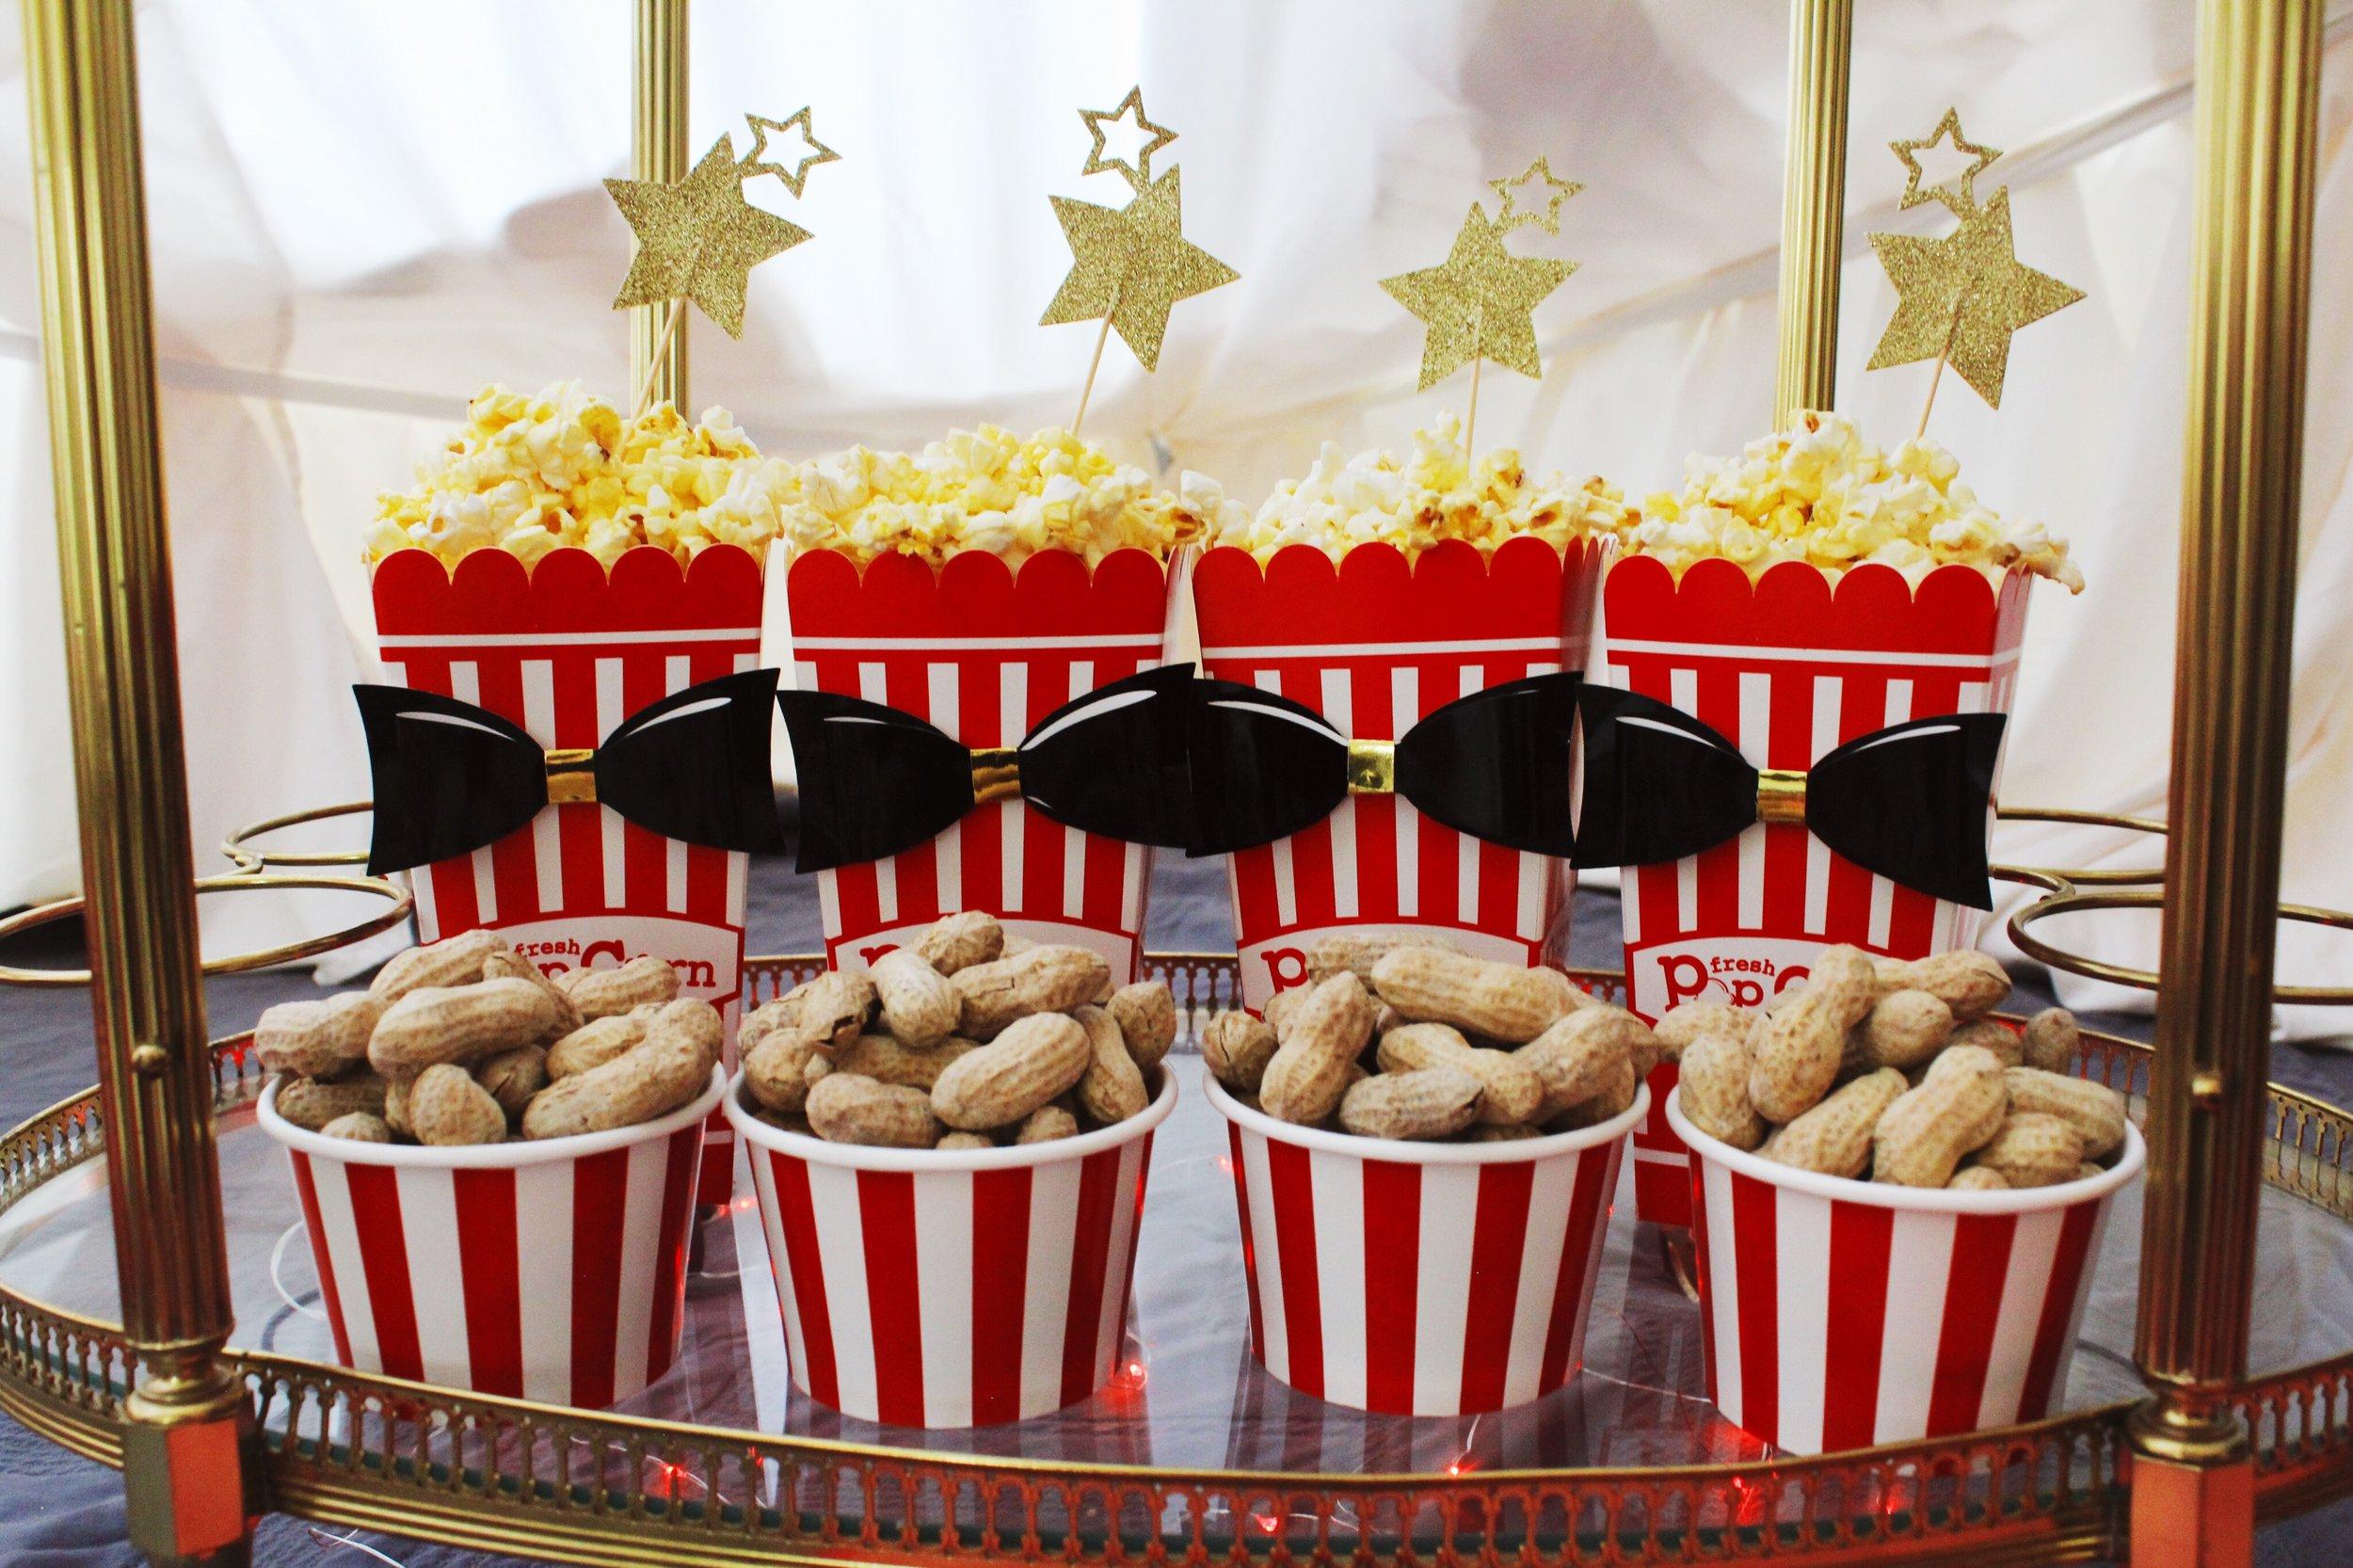 The Greatest Showman Movie Party_Bar Cart_Food Ideas_Circus Tent_Popcorn_Peanuts.JPG